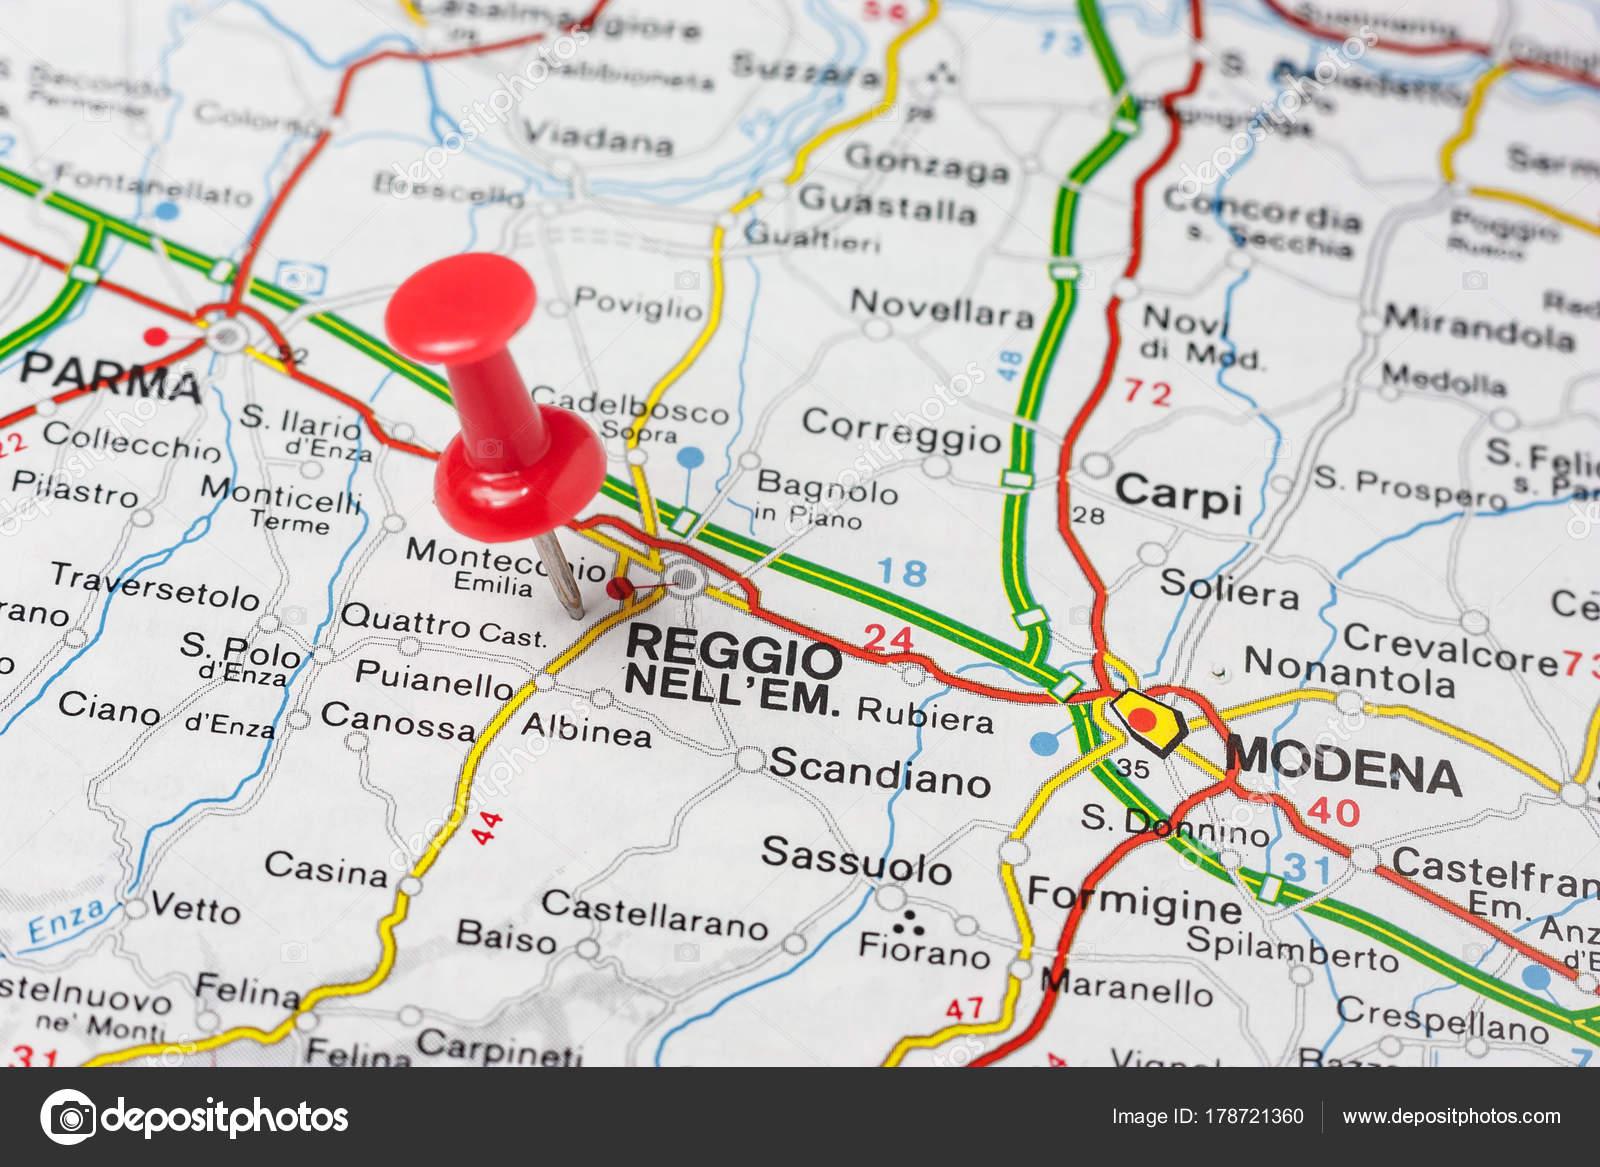 Reggio Emilia pinned on a map of Italy Stock Photo maior 178721360